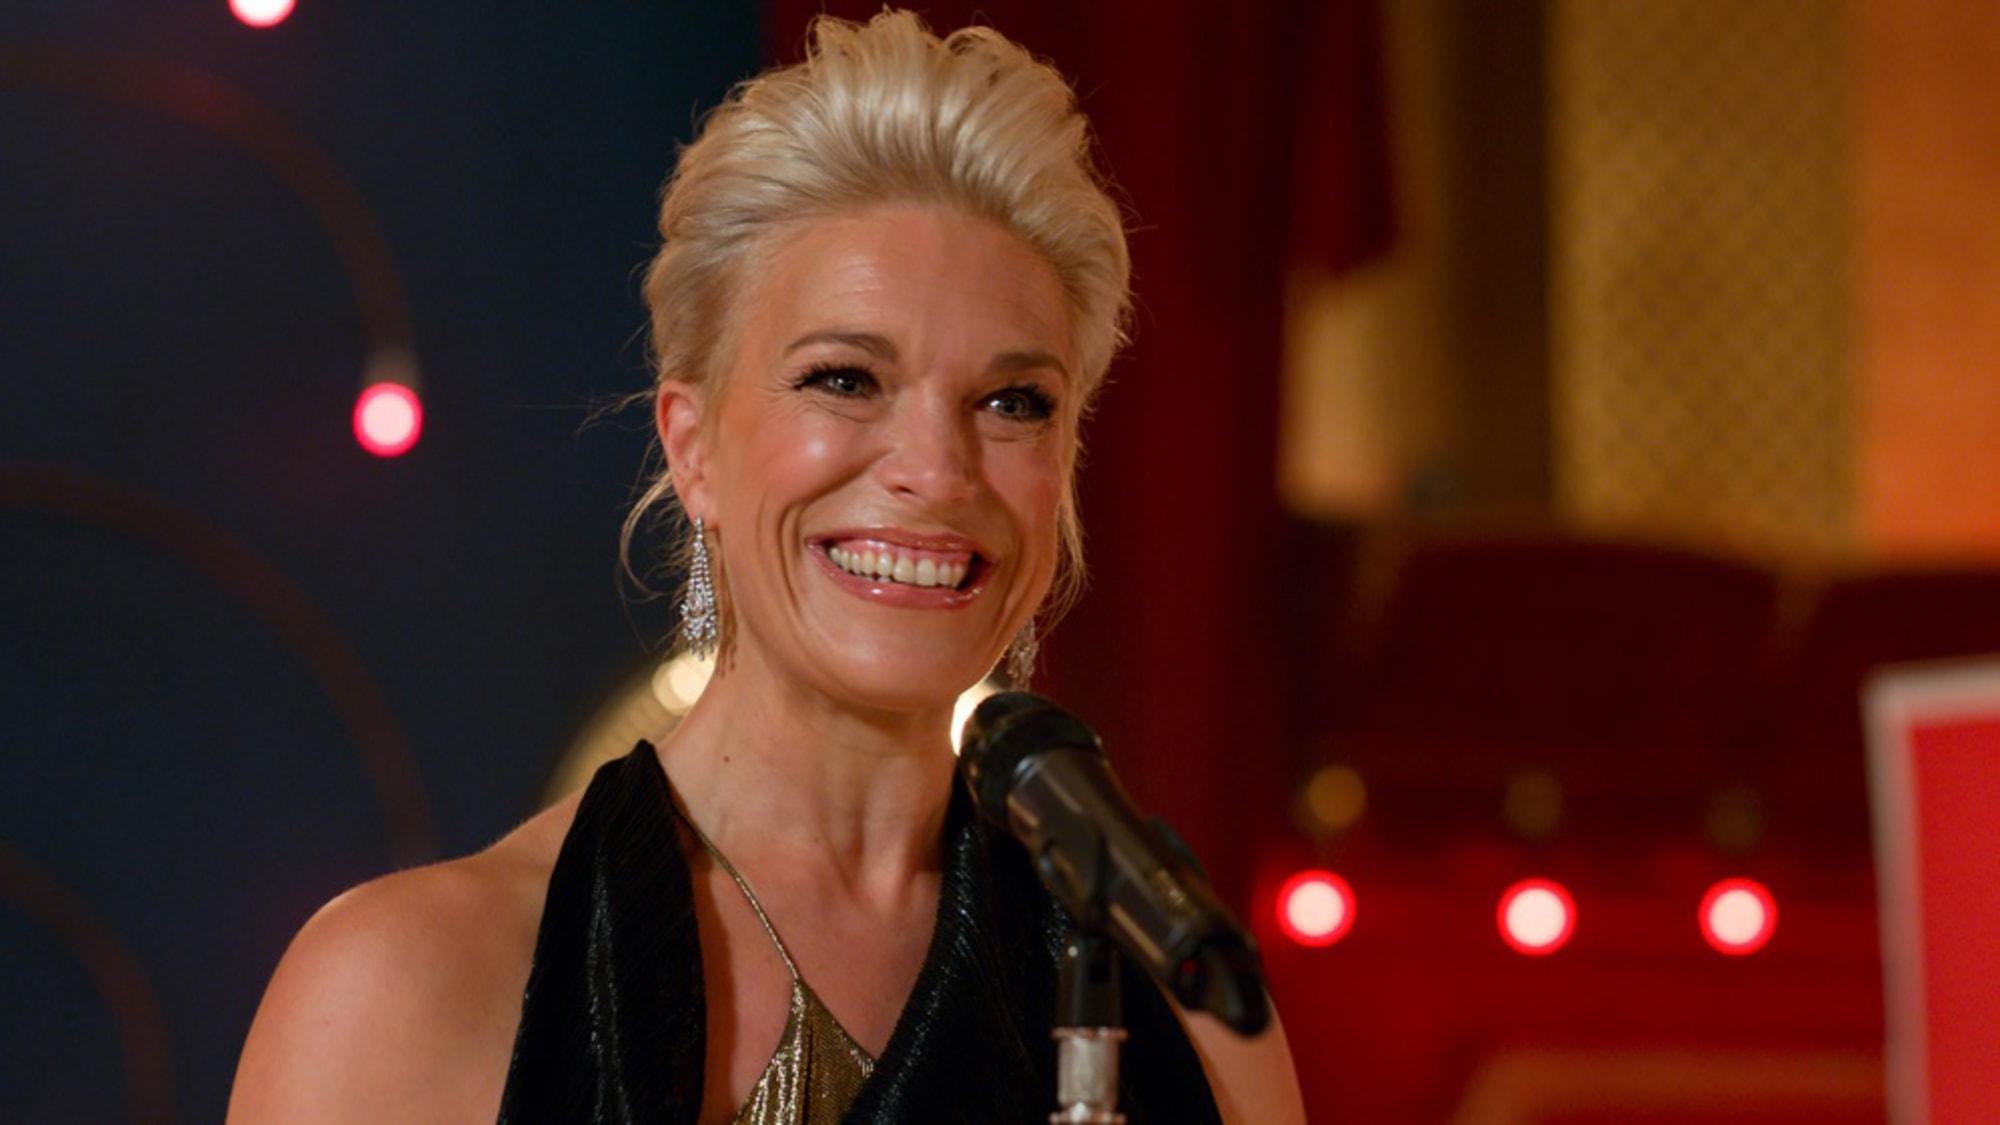 Ted Lasso Season 1, Episode 4 recap: Rebecca hosts a charity gala